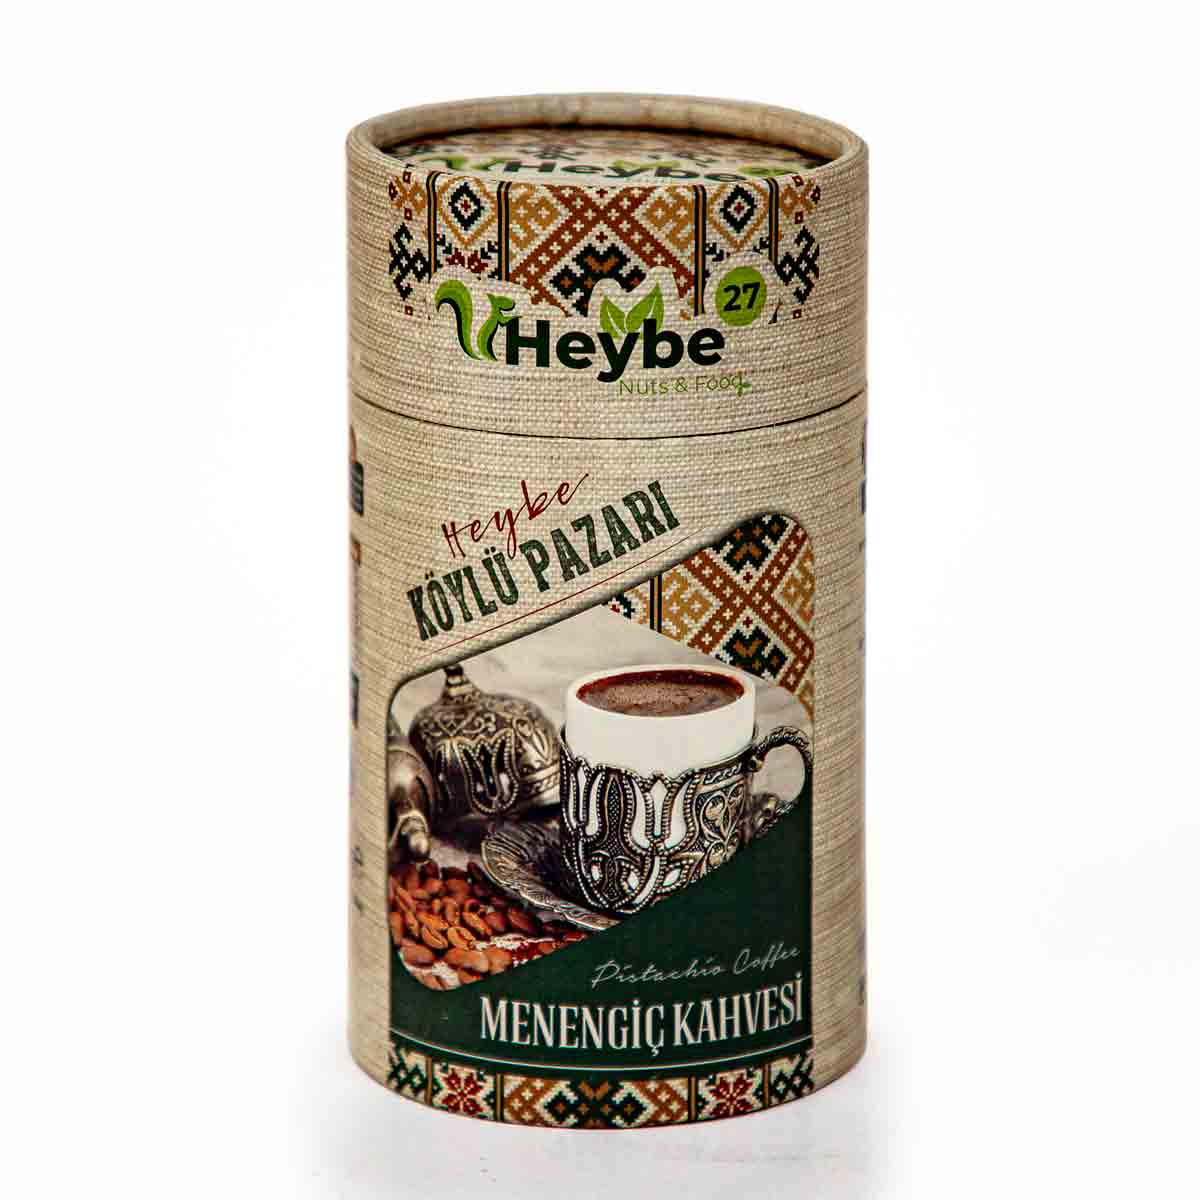 Heybe - Menengiç - Pistazien Kaffee - Menengiç kahvesi (Terebinthe Kaffee)